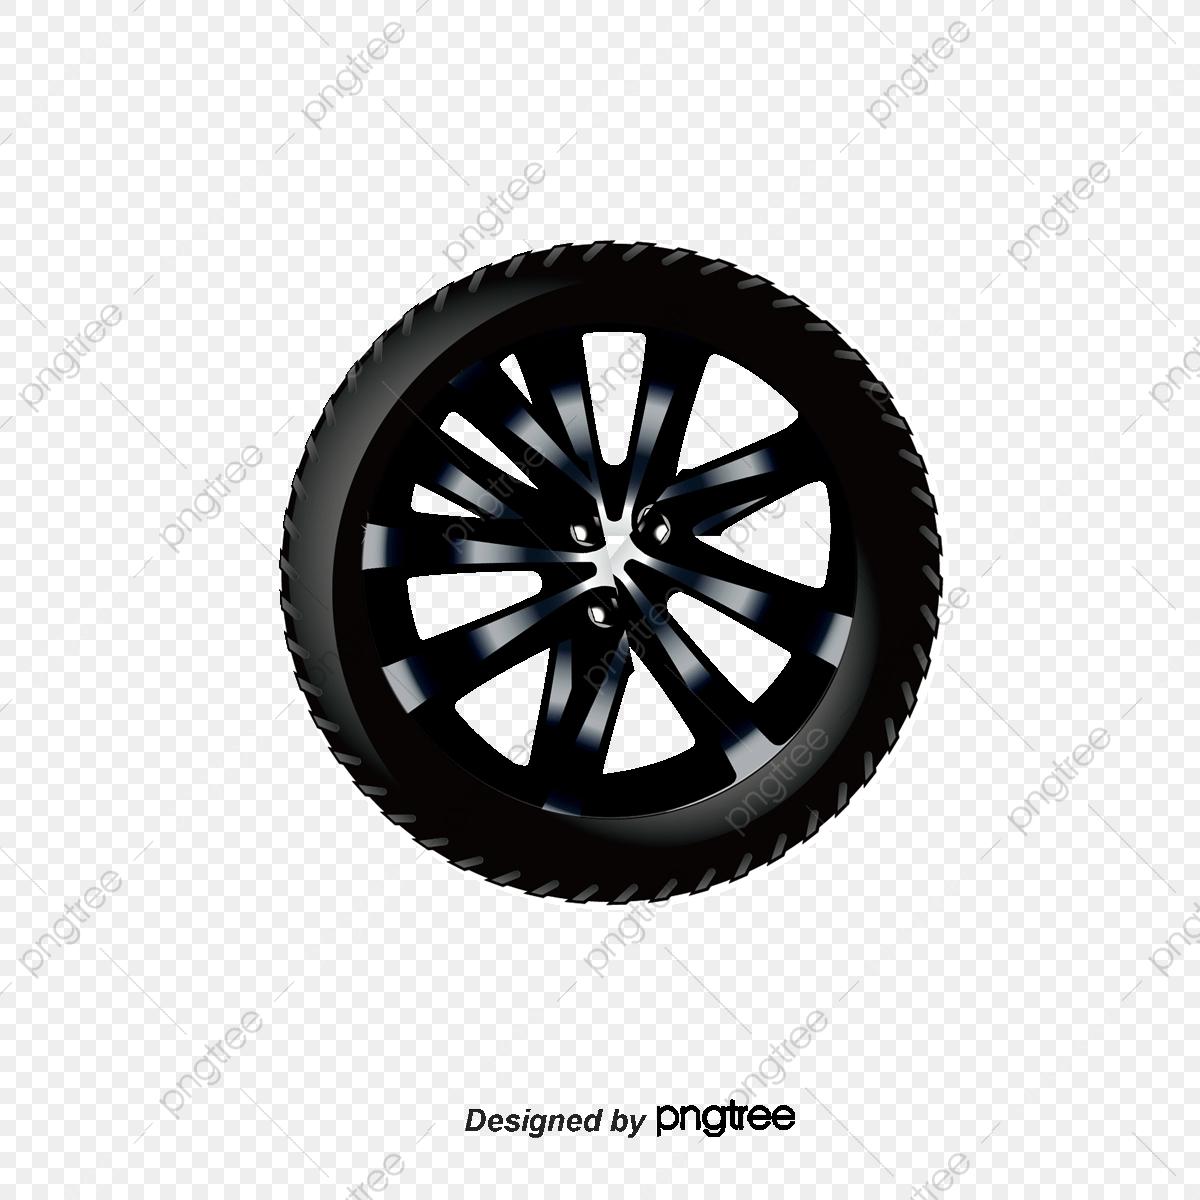 Car Wheel Tires, Beautifully Tire, Rims, Tire PNG Transparent.